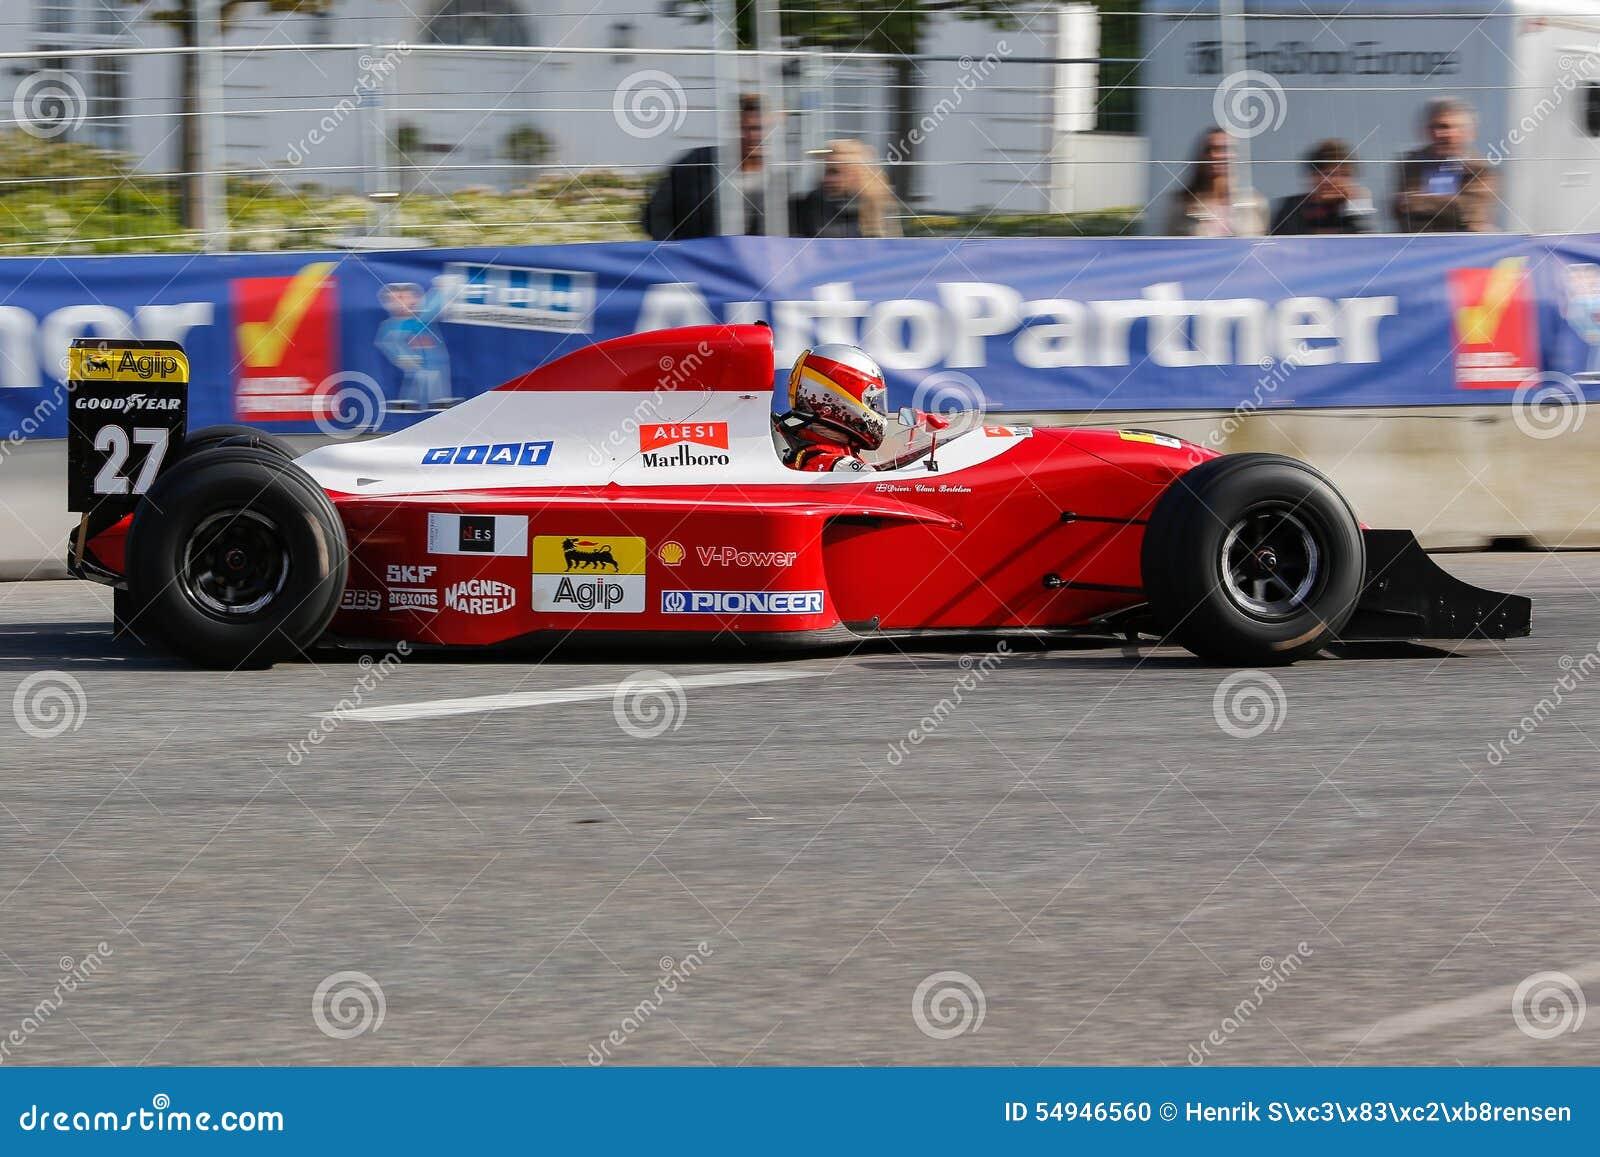 Claus Bertelsen Dans Un Formule 1 De Ferrari Jean Alesi